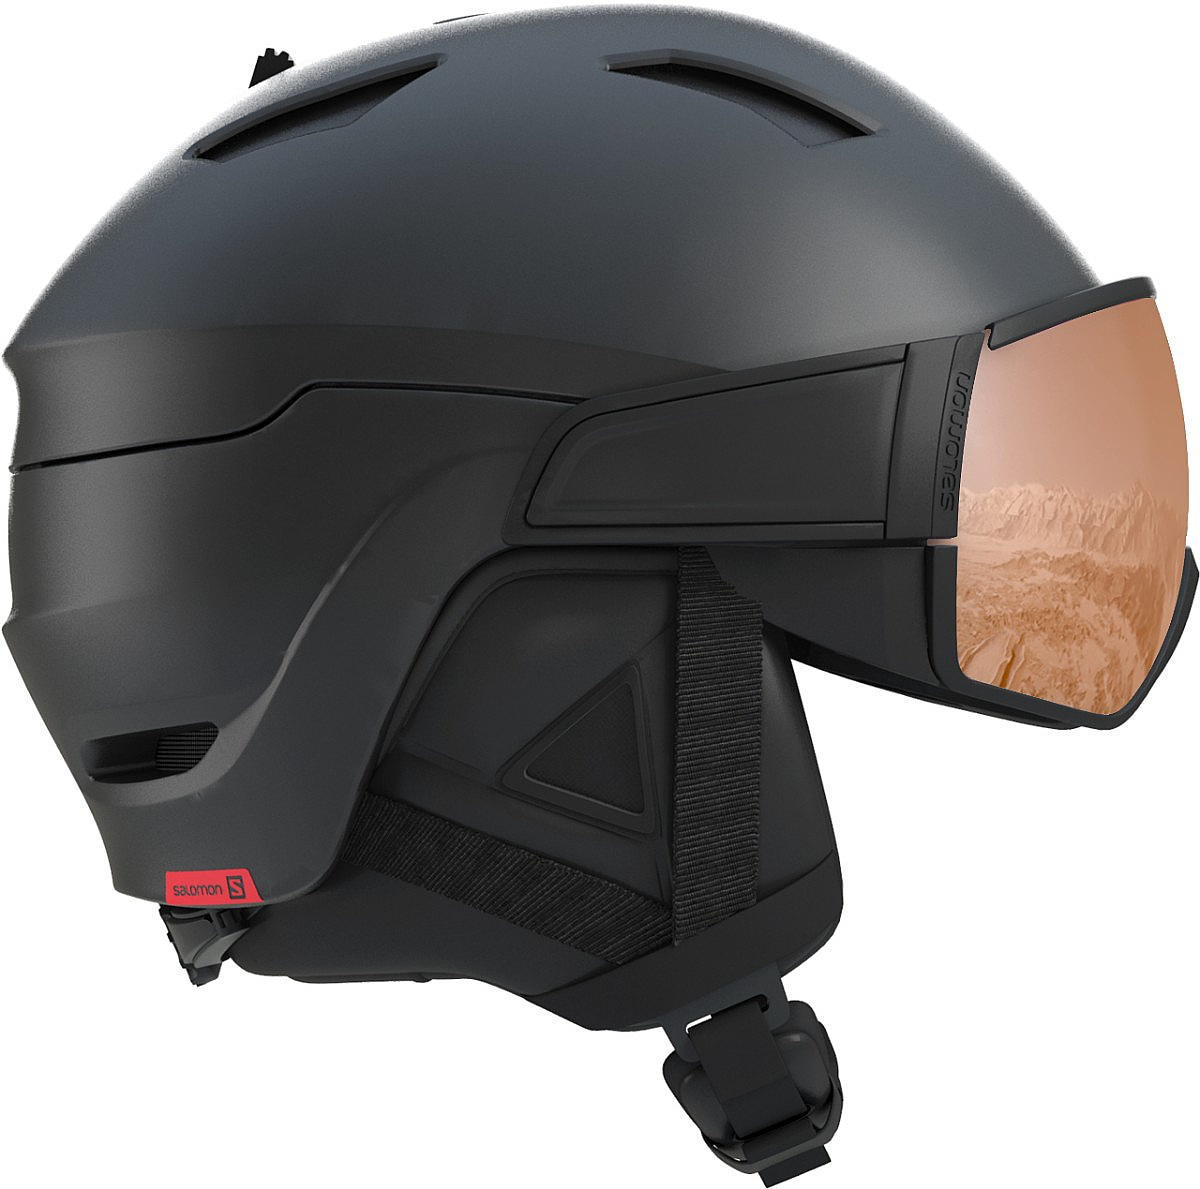 helma Salomon Driver S - Black/Red Accent/Univrsal L